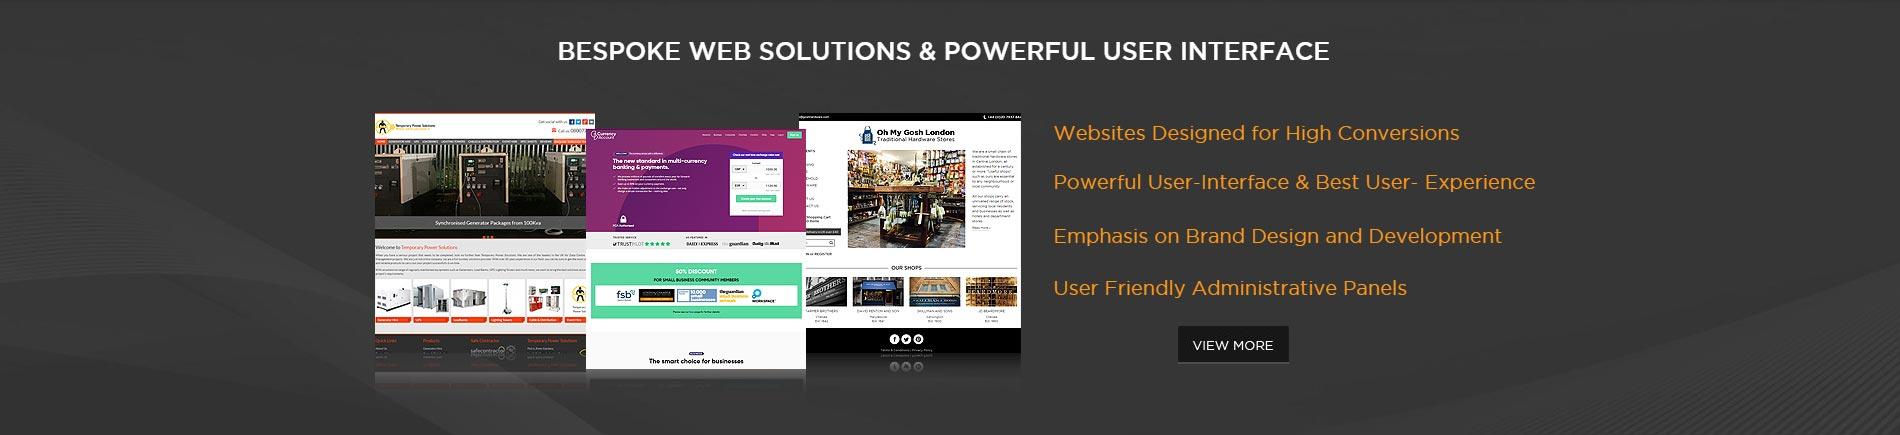 Bespoke Web-UI Development - KOL Limited